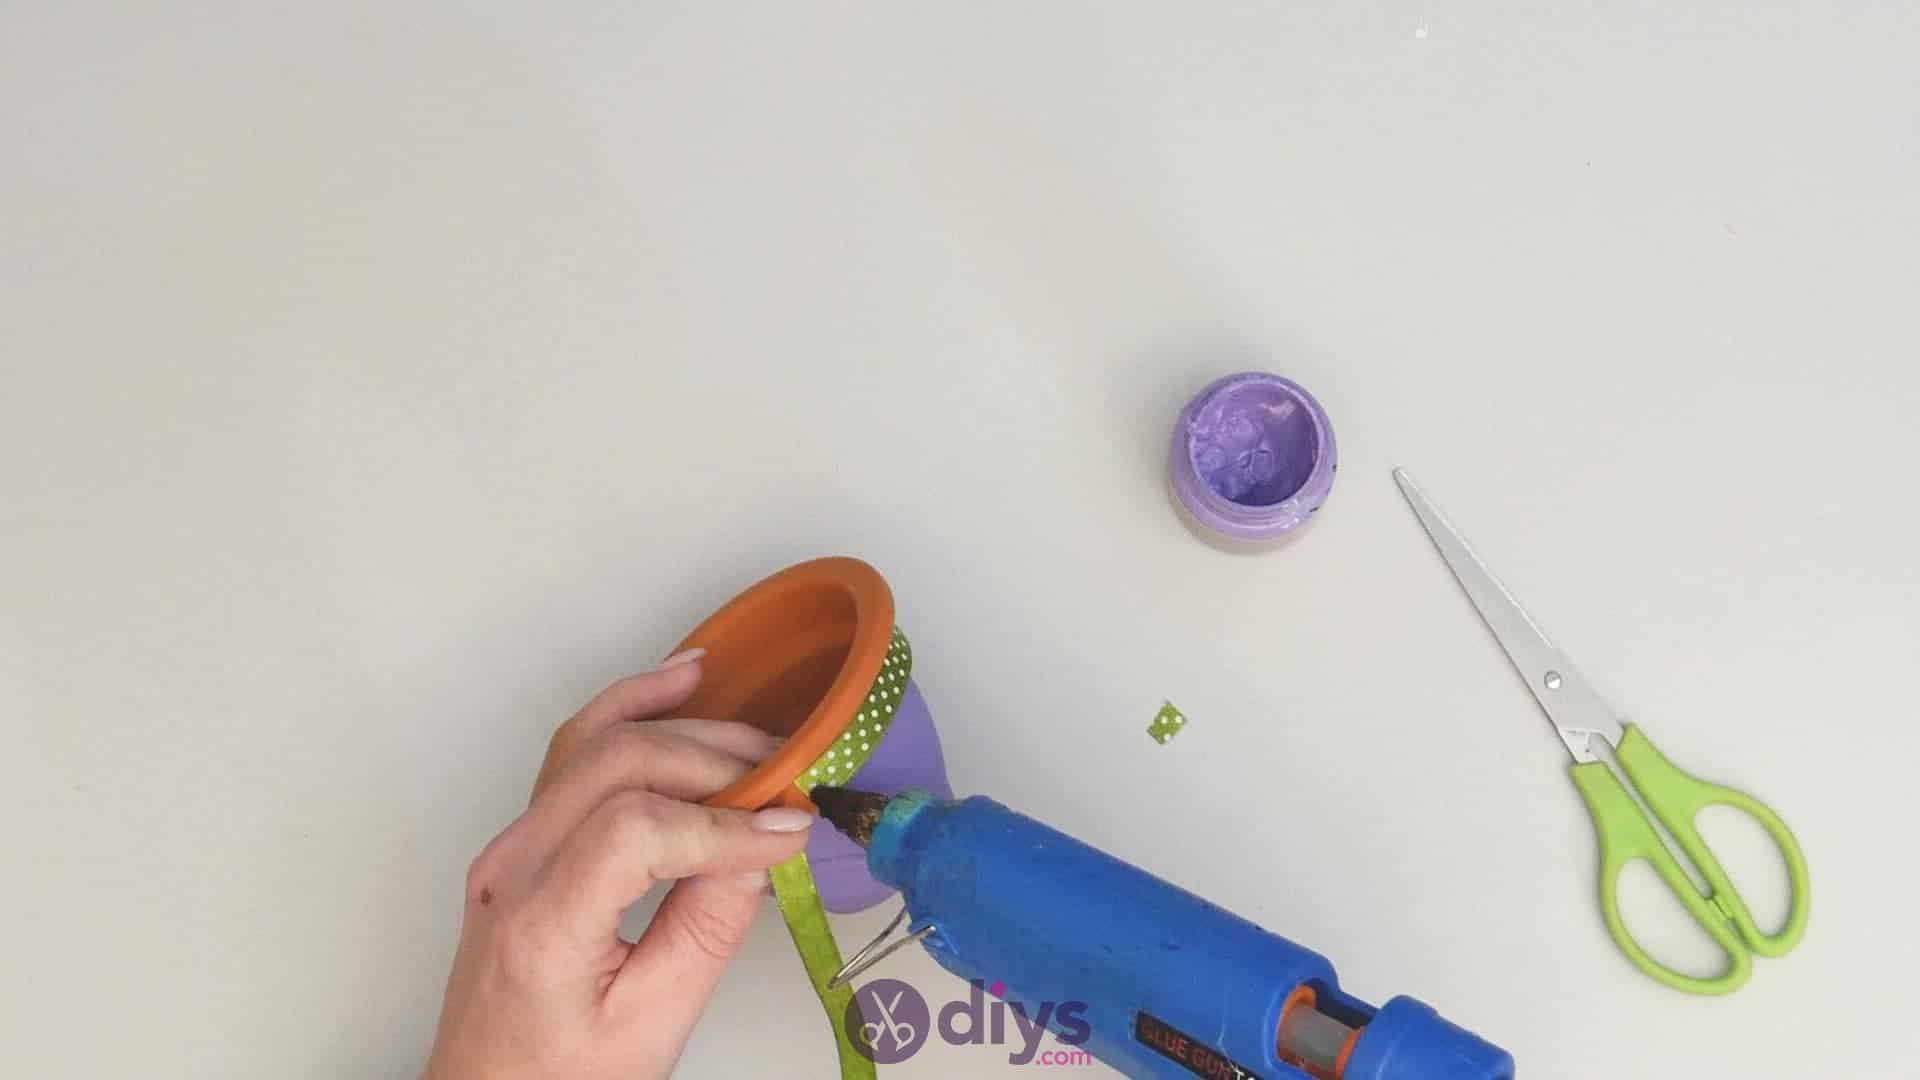 Diy colourful flower pot step 3c